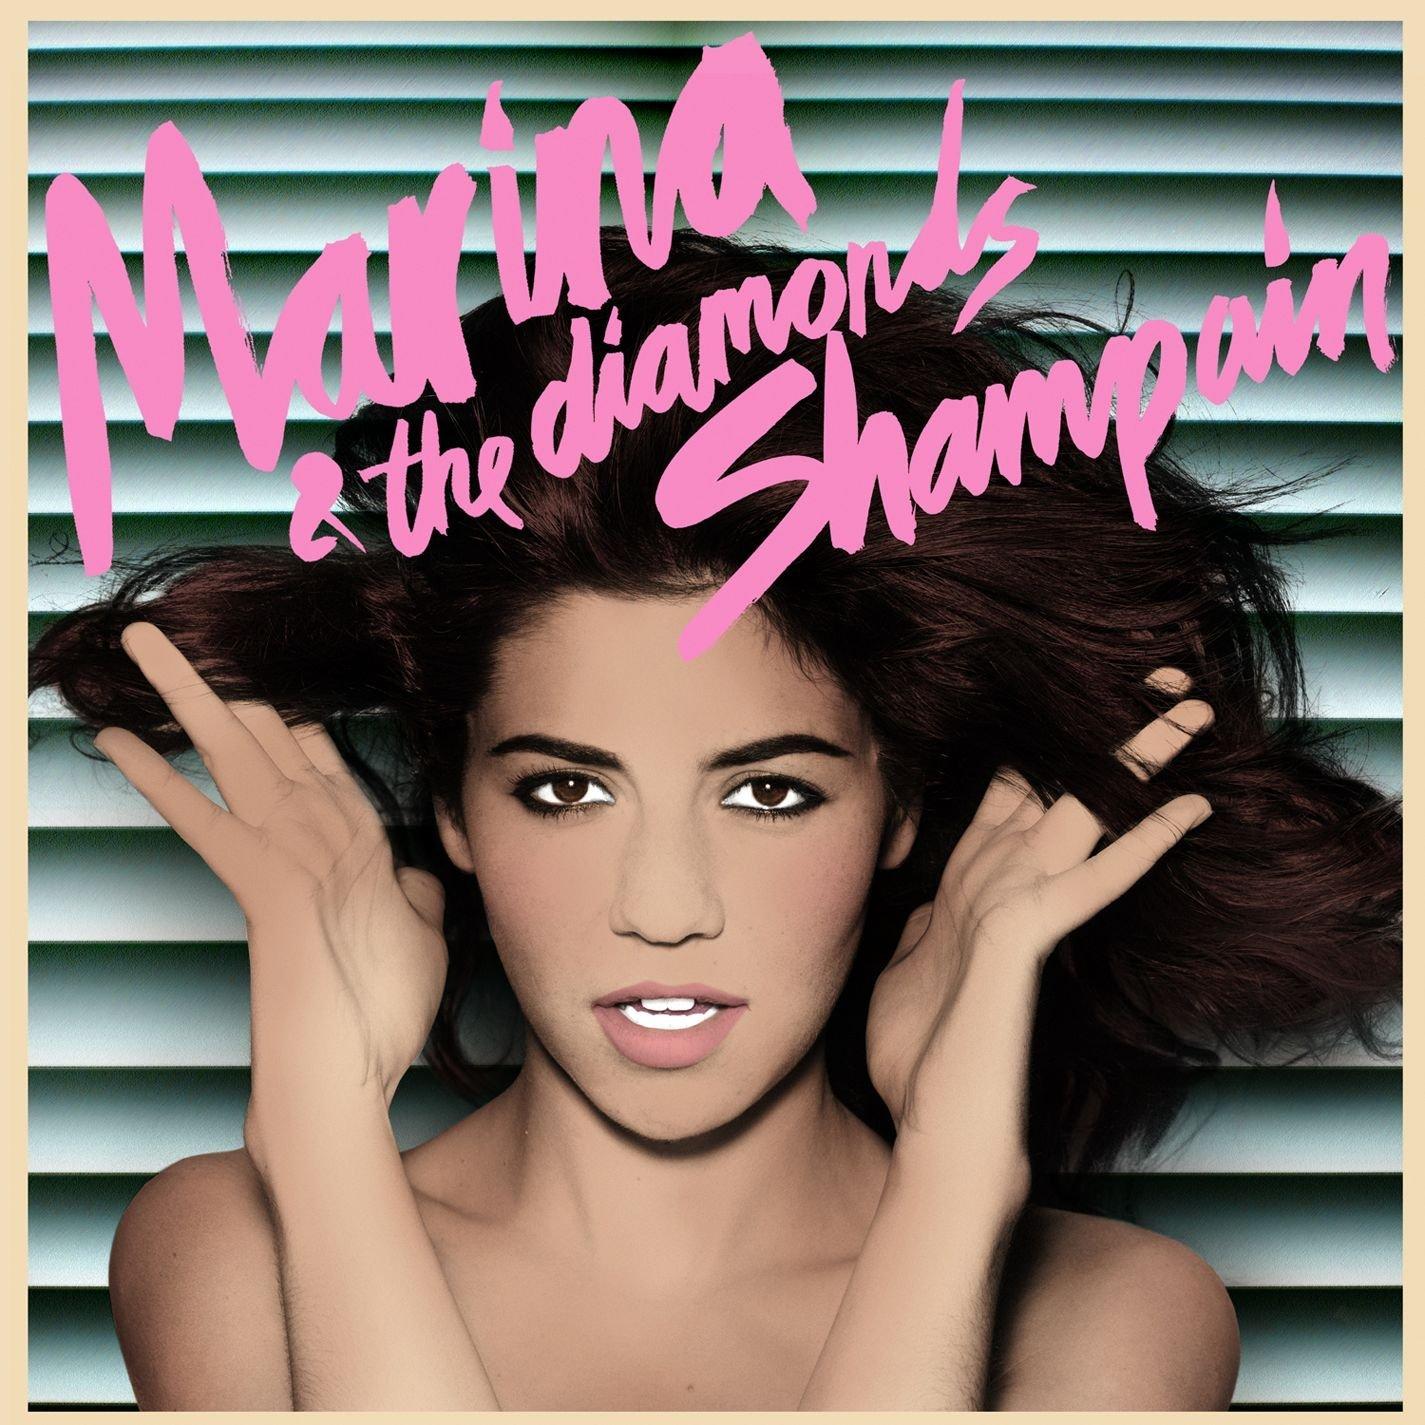 Marina and the diamonds singles